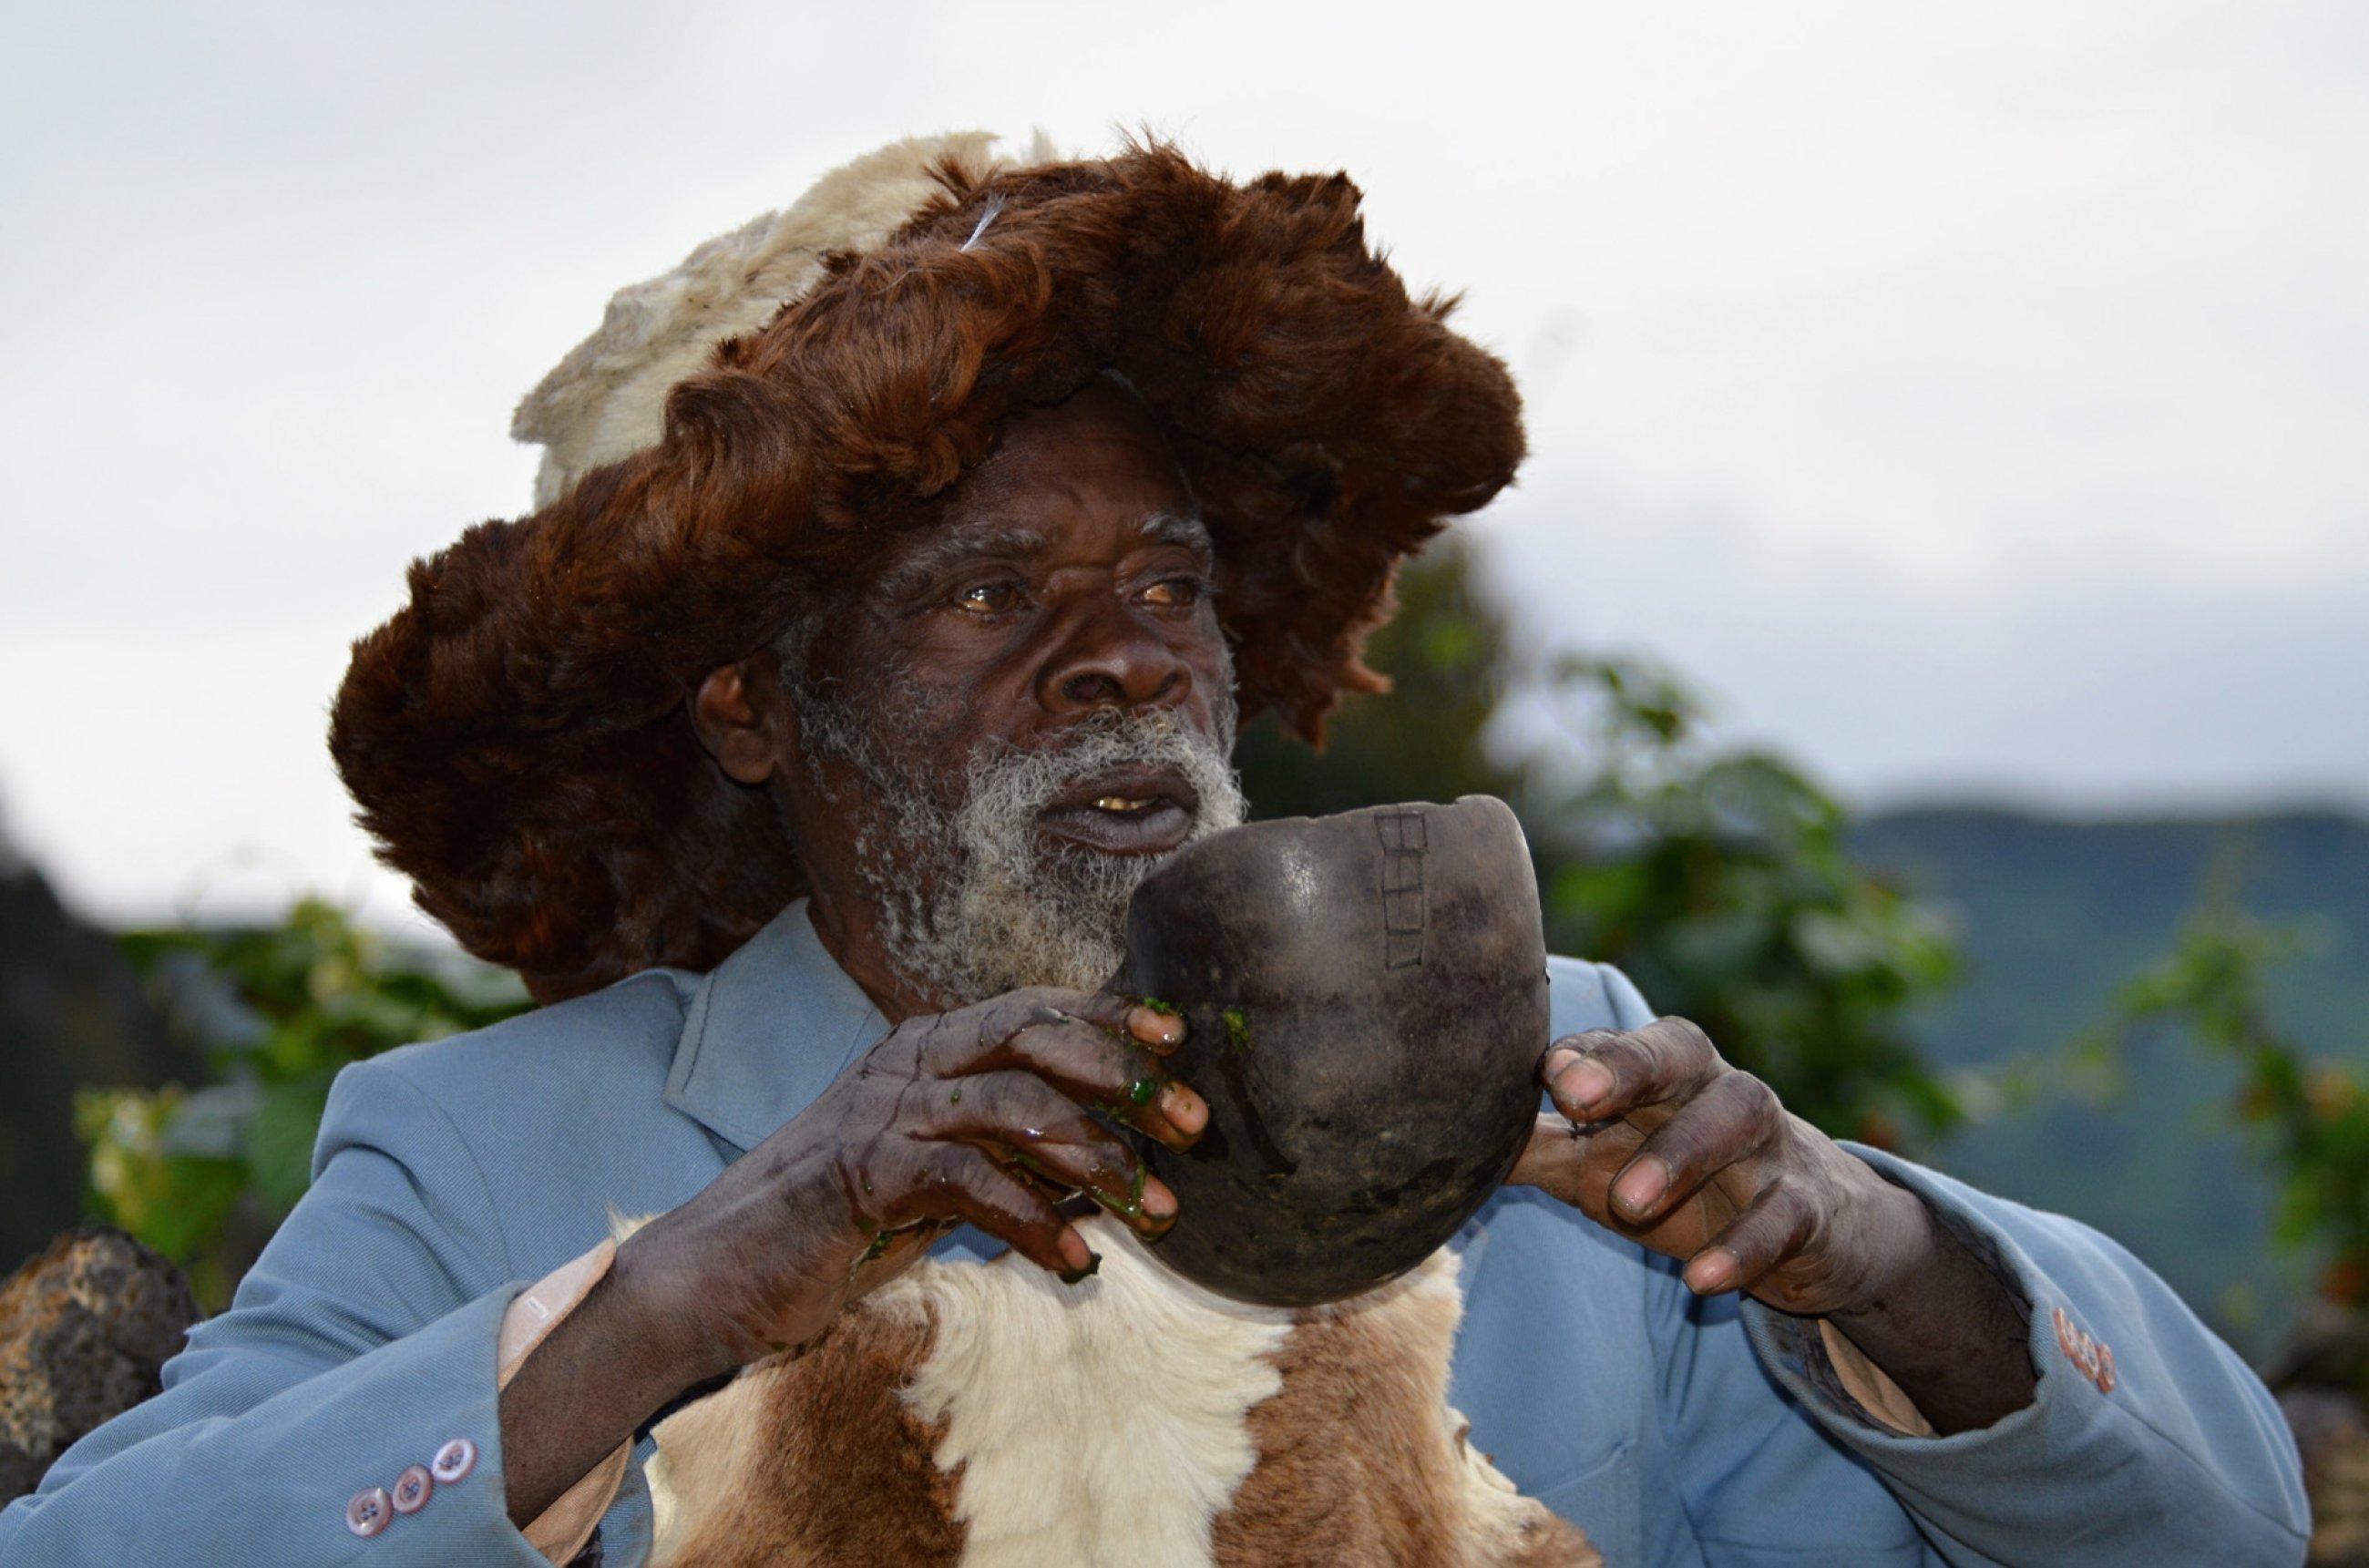 https://bubo.sk/uploads/galleries/4986/burundi-rwanda-uganda-kongo-martin-karnis-4032-10-.jpg